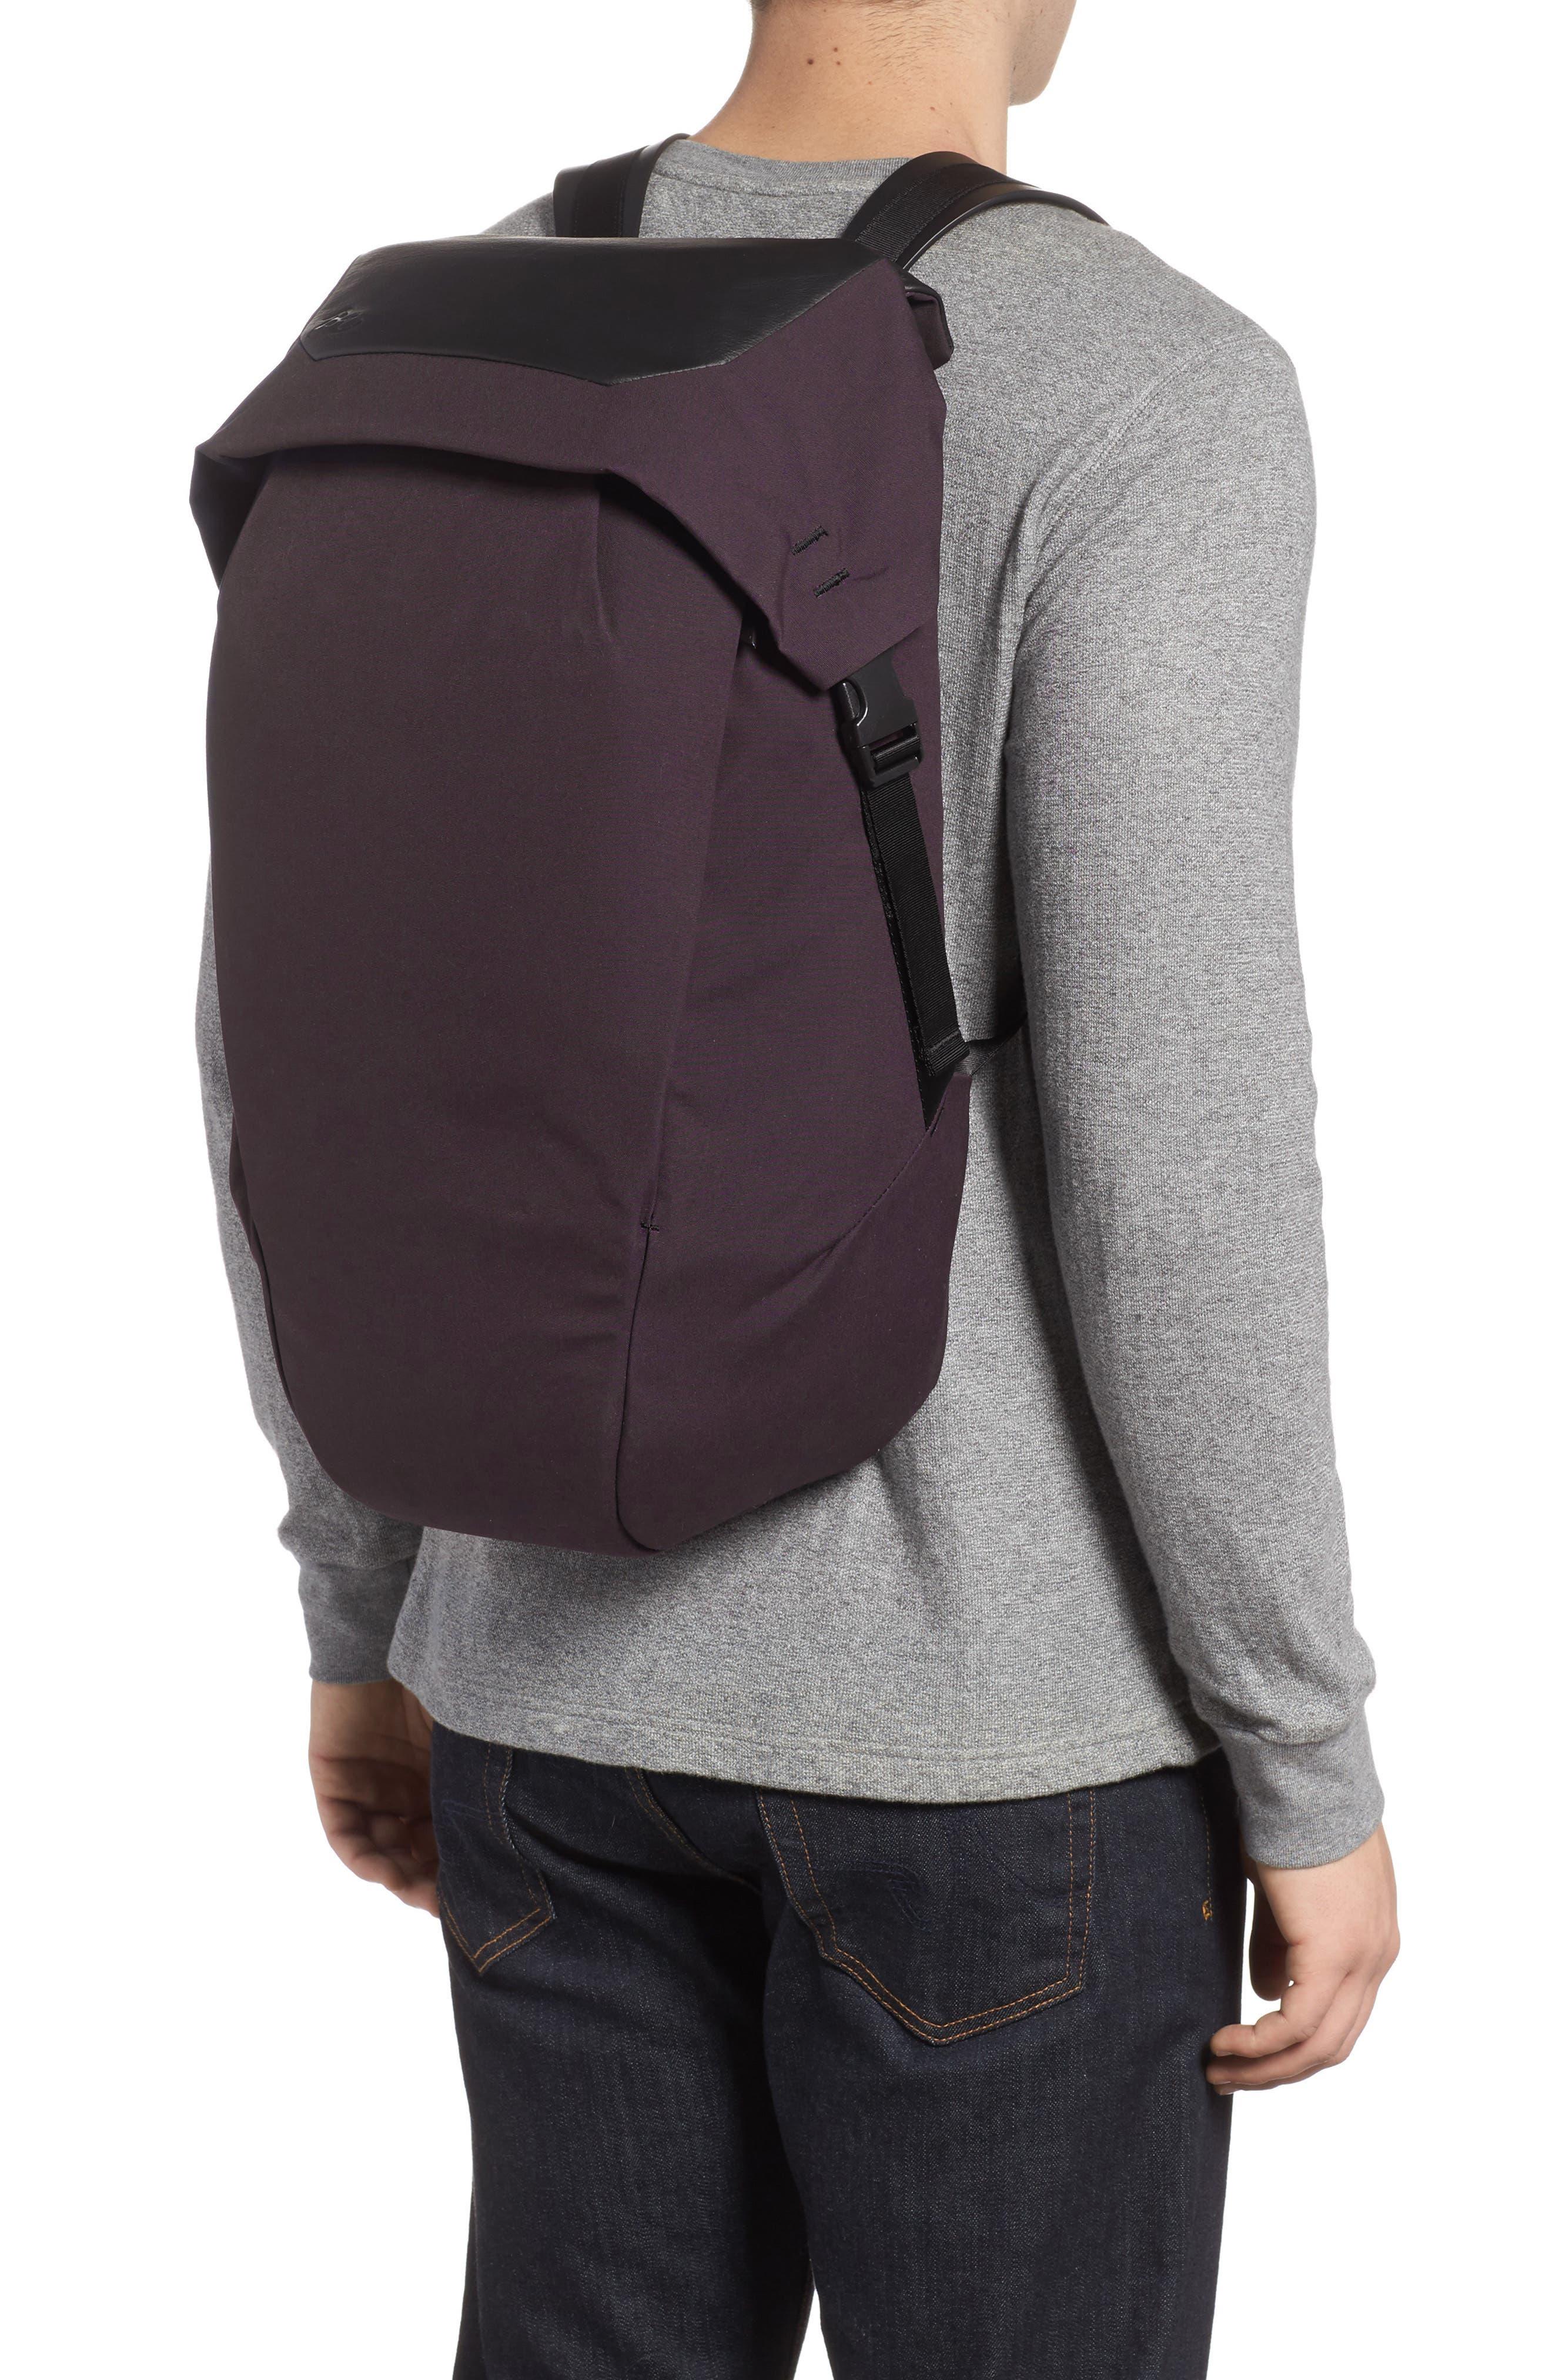 Locker Pack Lux Backpack,                             Alternate thumbnail 2, color,                             Port